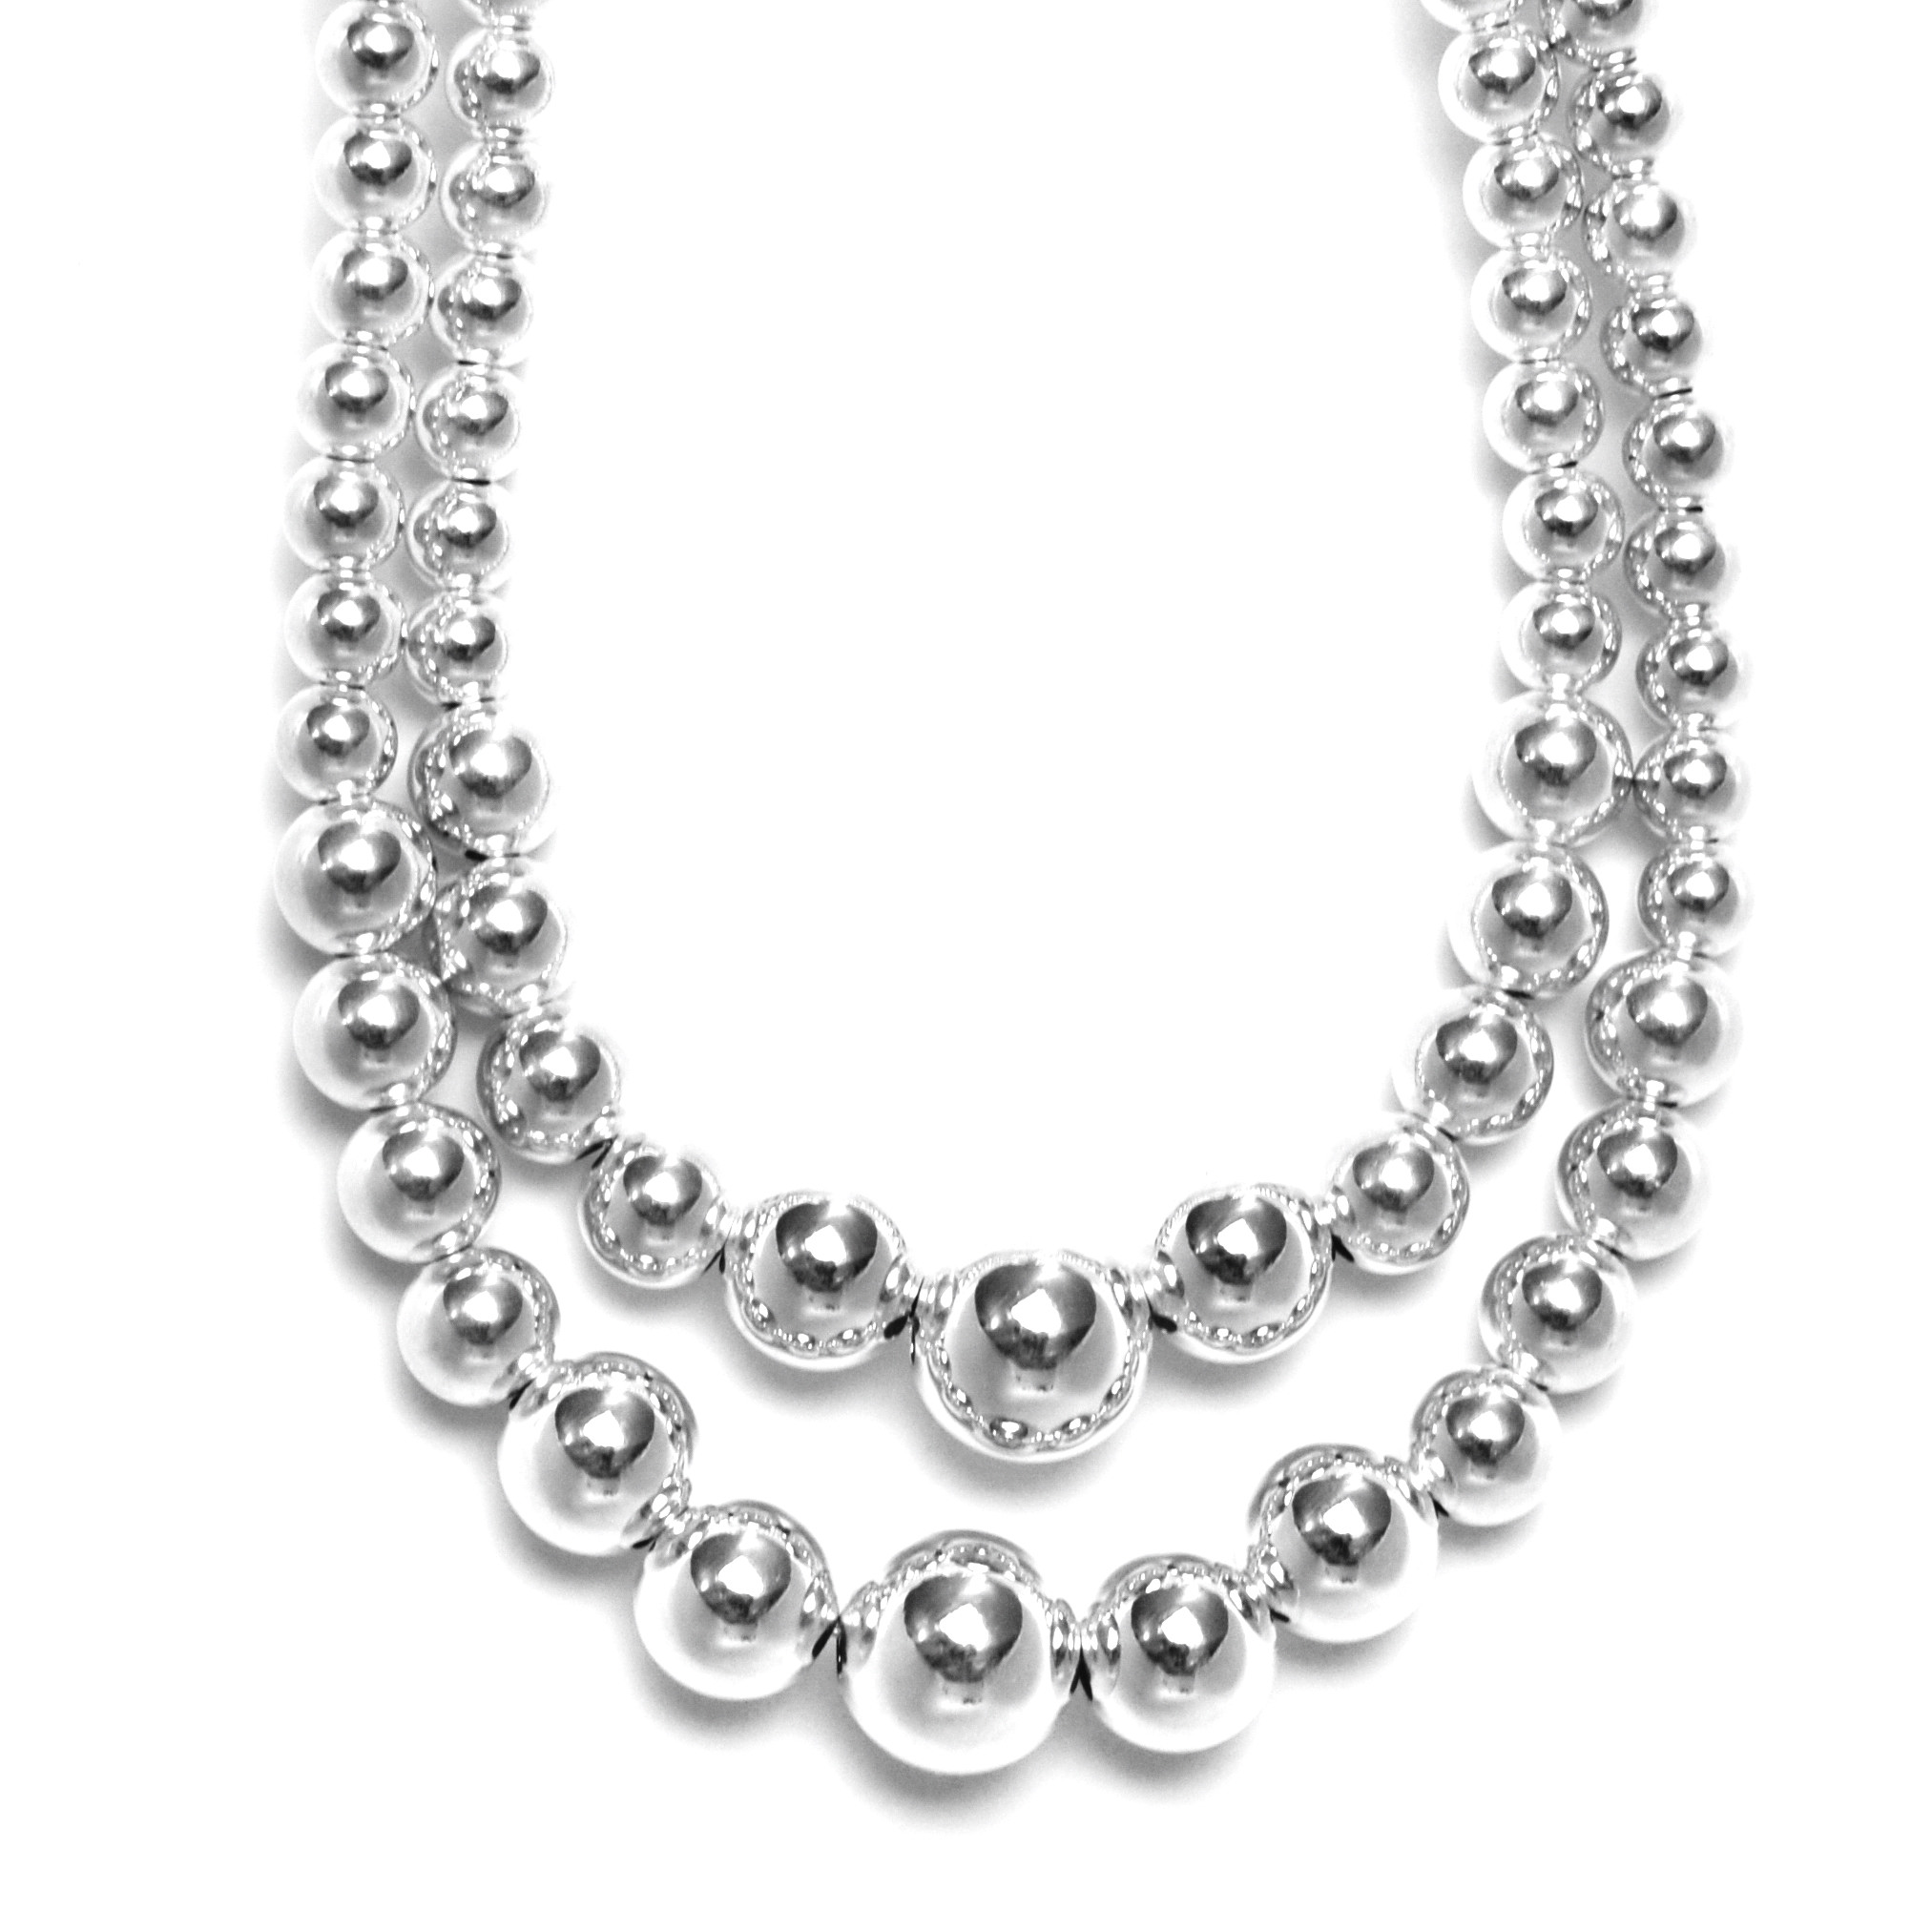 Silver Beads: Leonor Heleno Designs – Fashion Jewelry